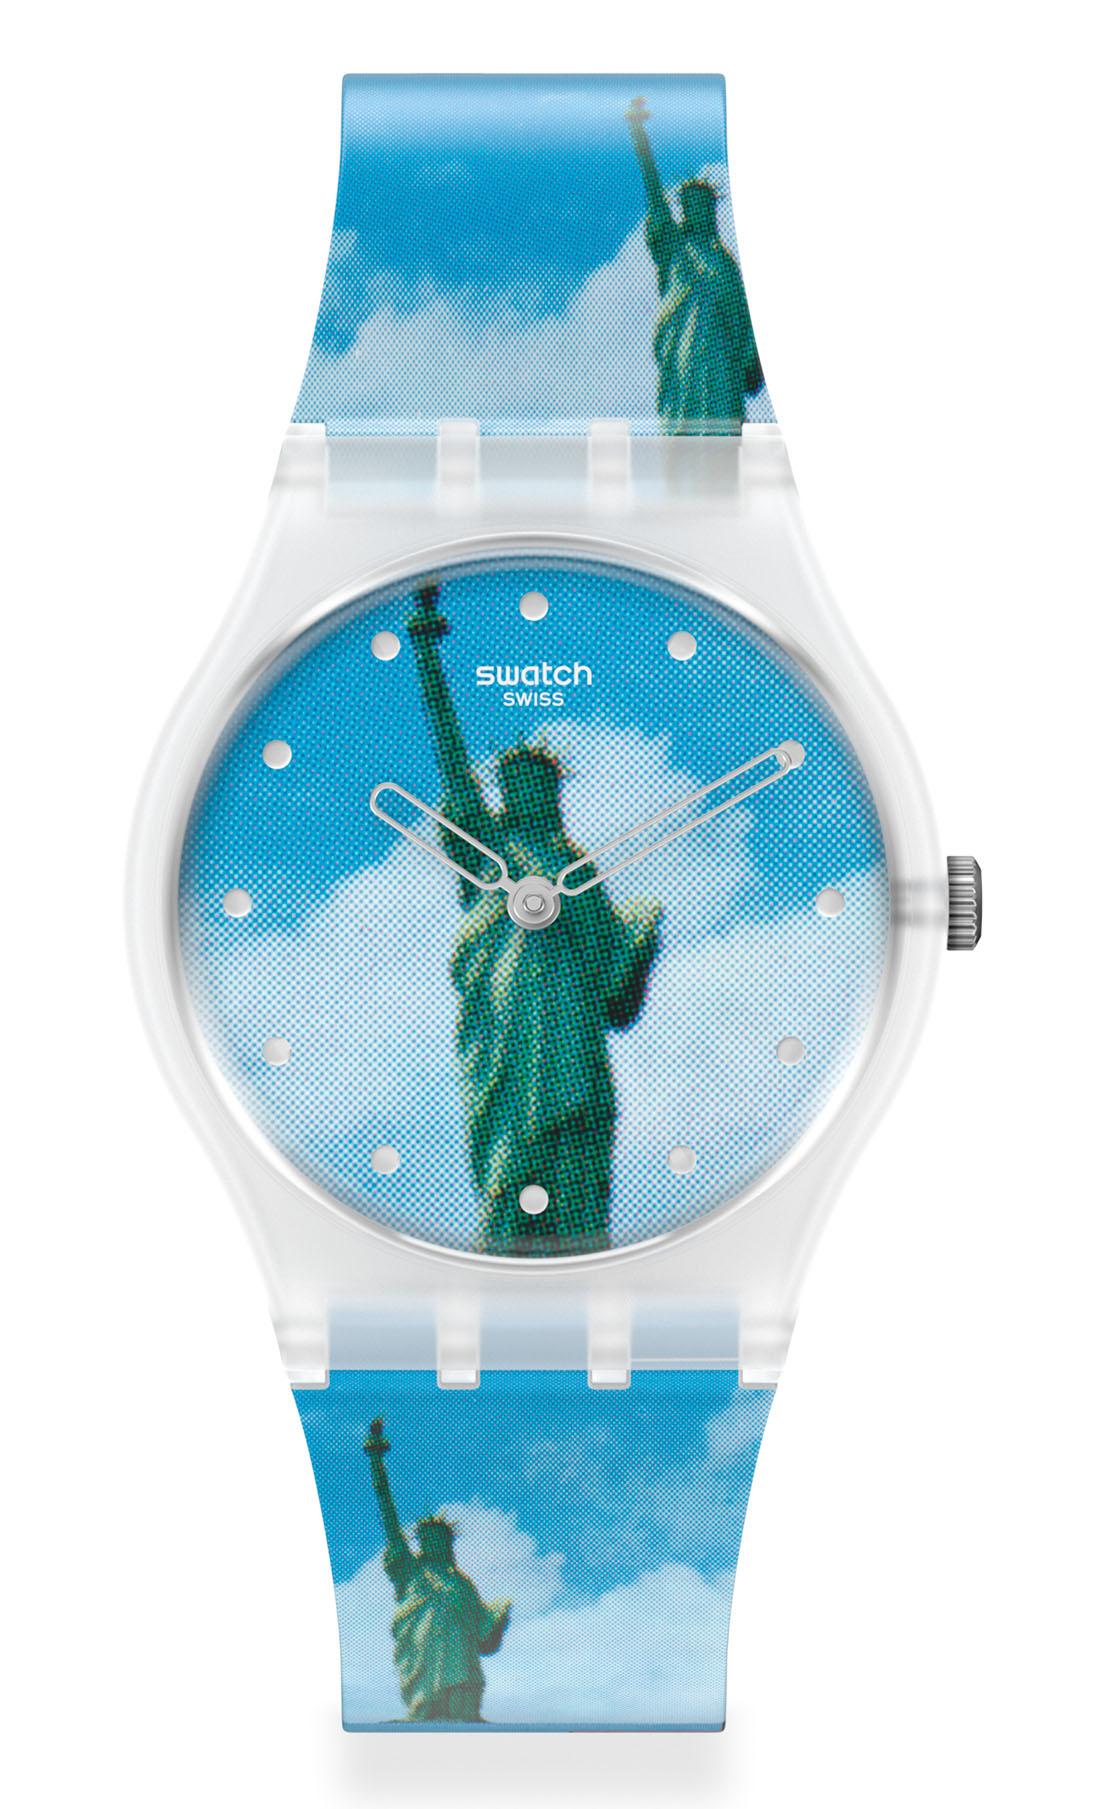 Swatch x MoMA New York - New York